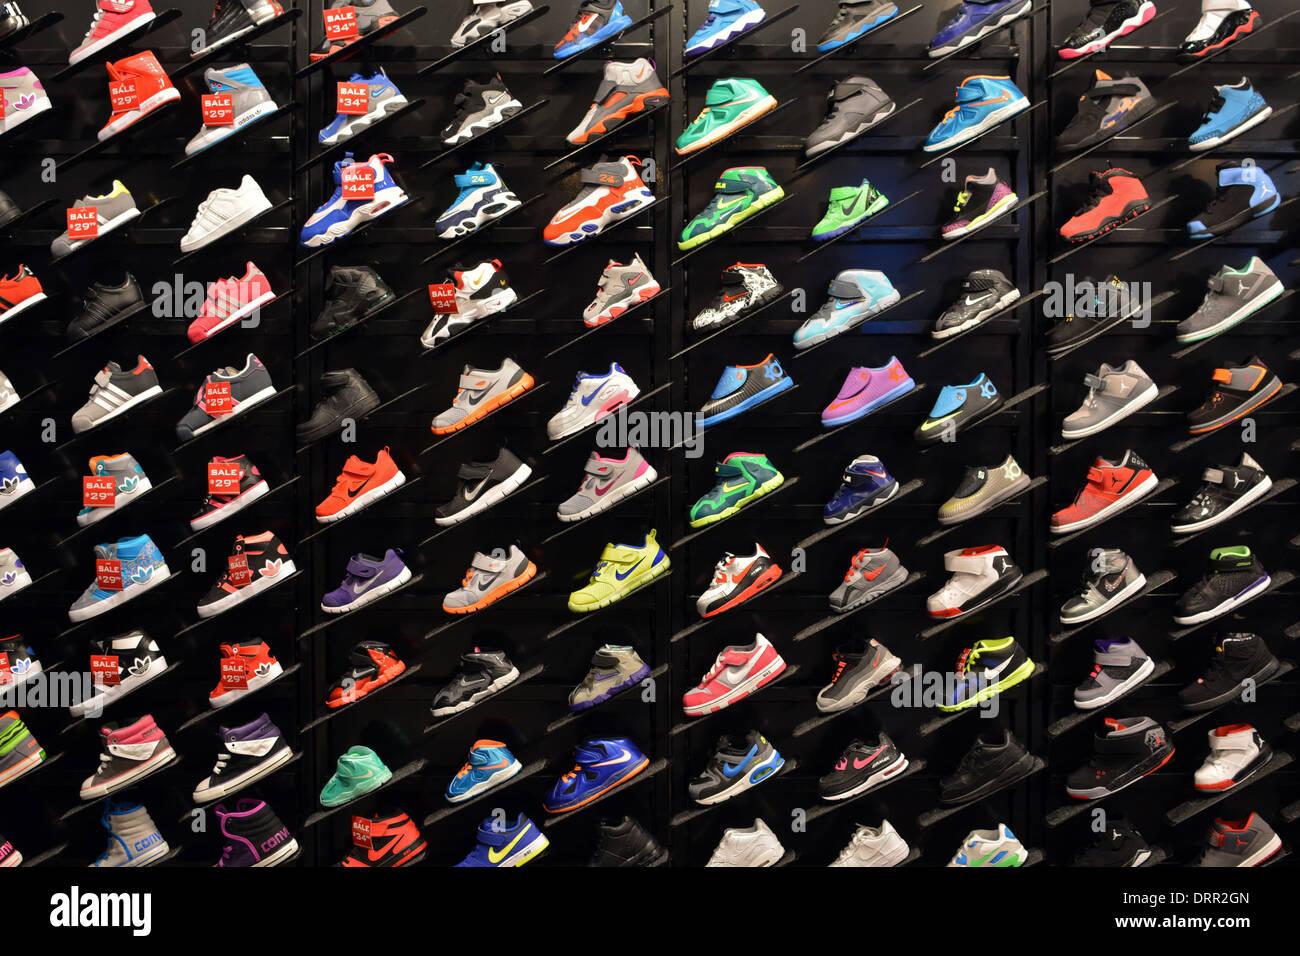 athletic shoes at Foot locker sporting